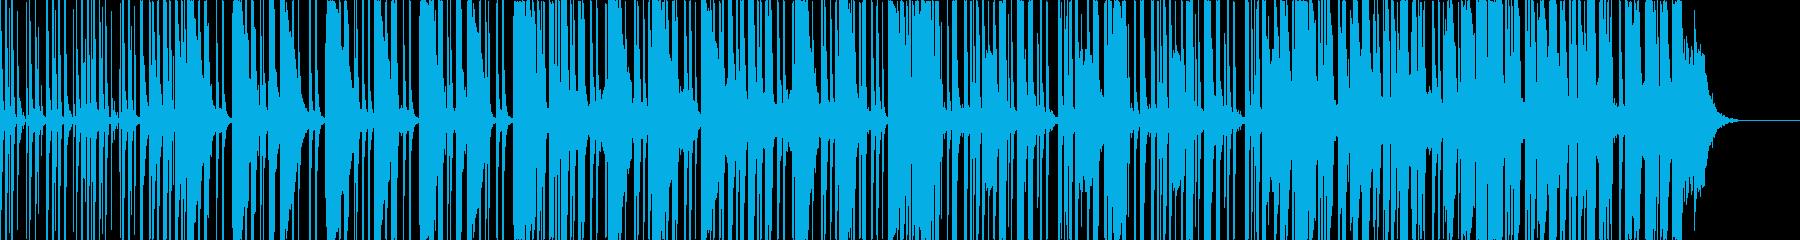 HipHop ラップバトルフリースタイルの再生済みの波形